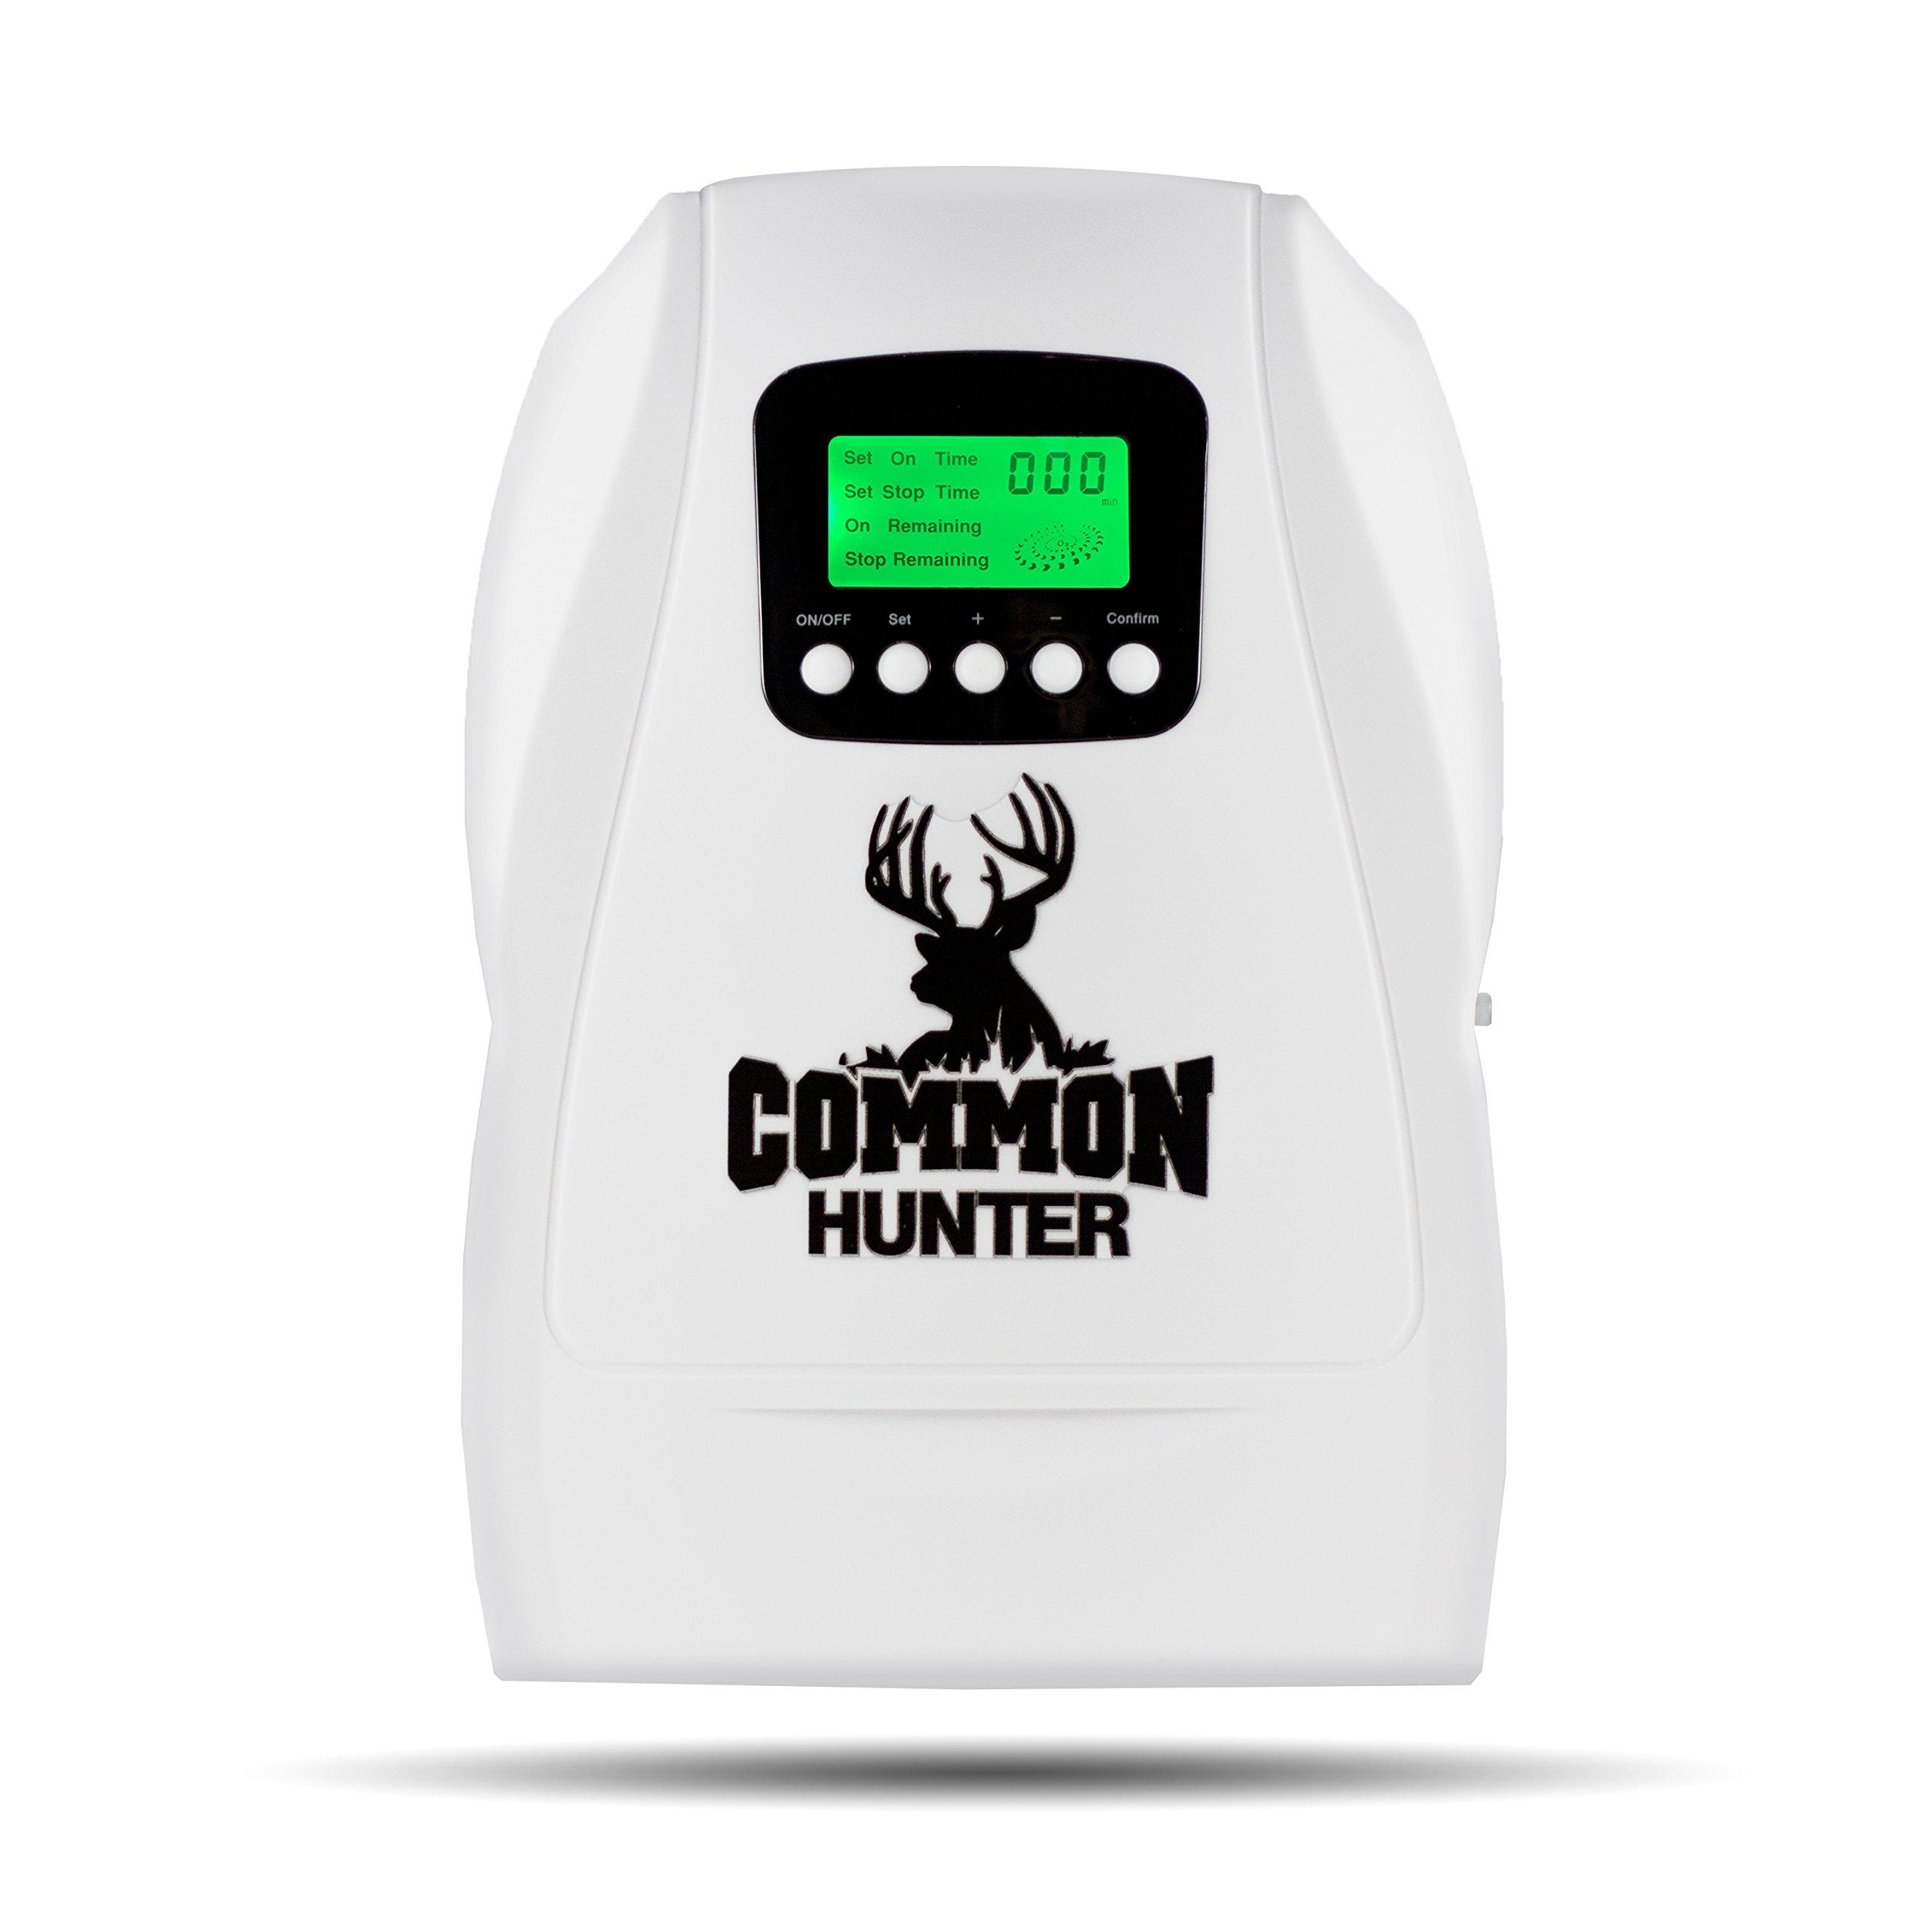 Common Hunter Eliminator O3 Ozone Air Purification Unit - Odor Elimination System for Deer Hunting Gear Bag